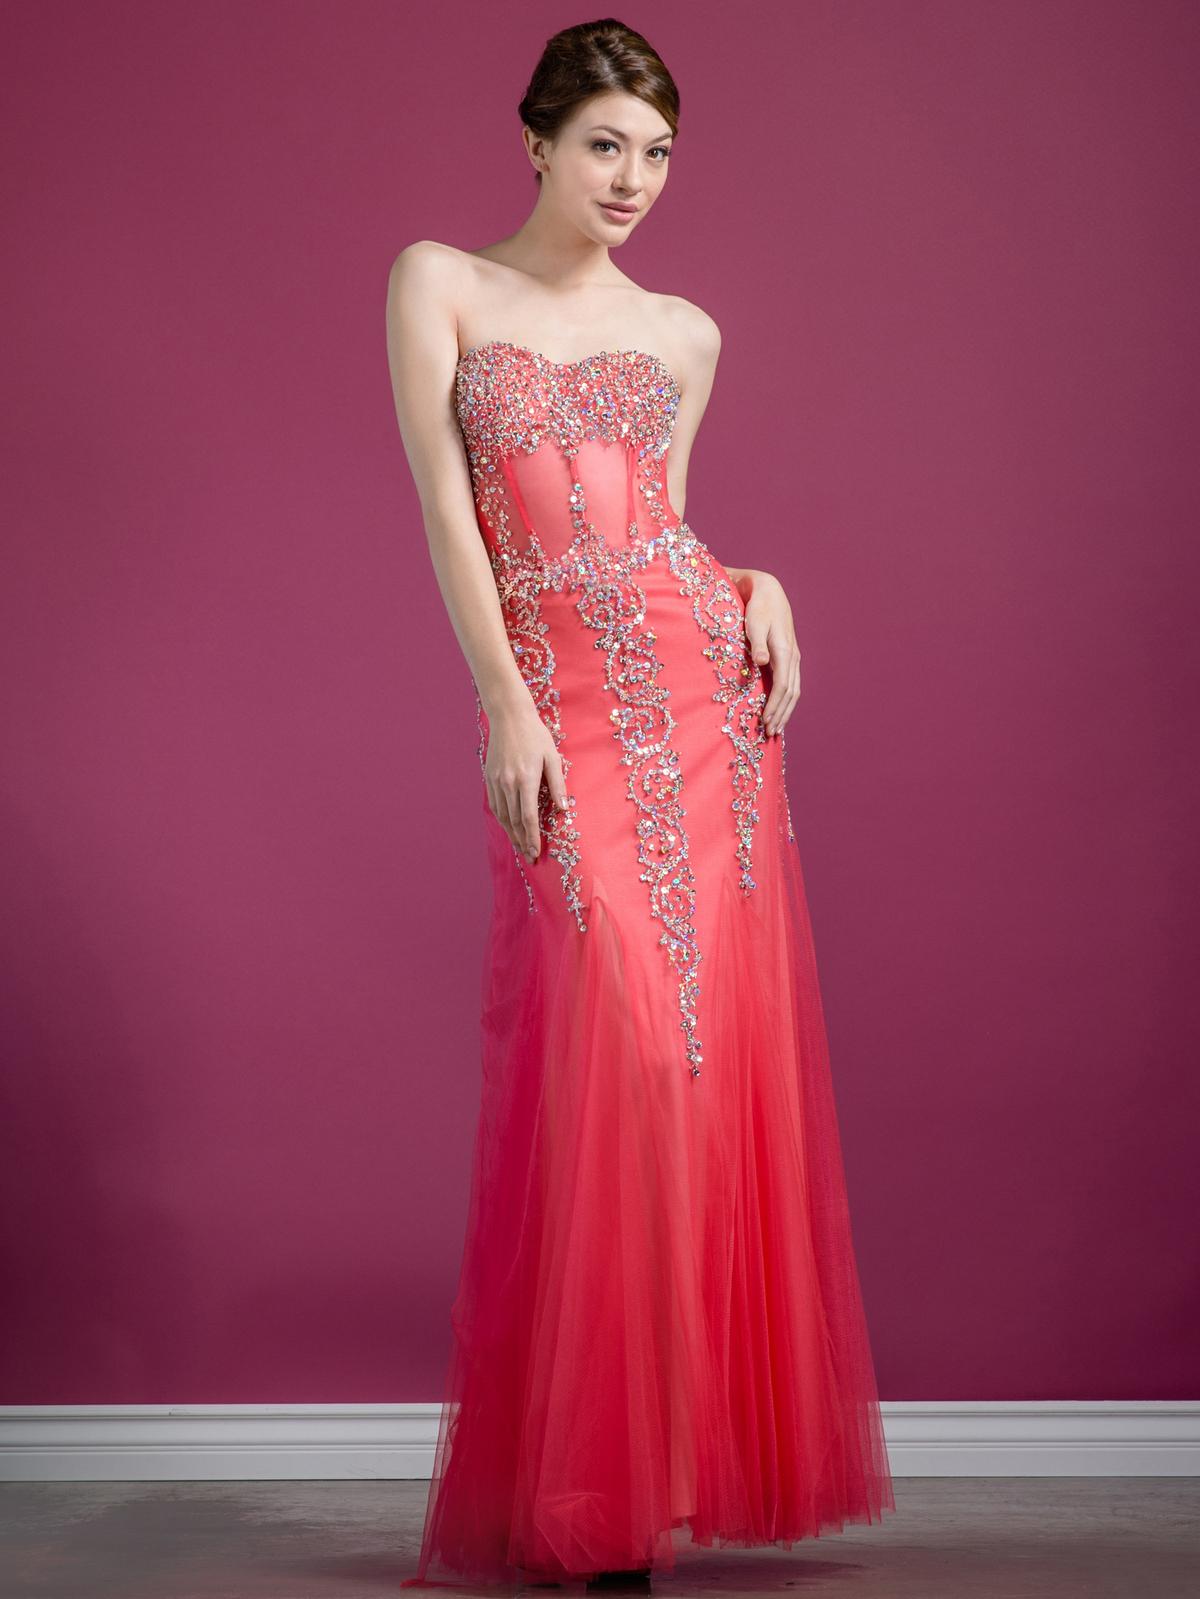 Coral Evening Dress